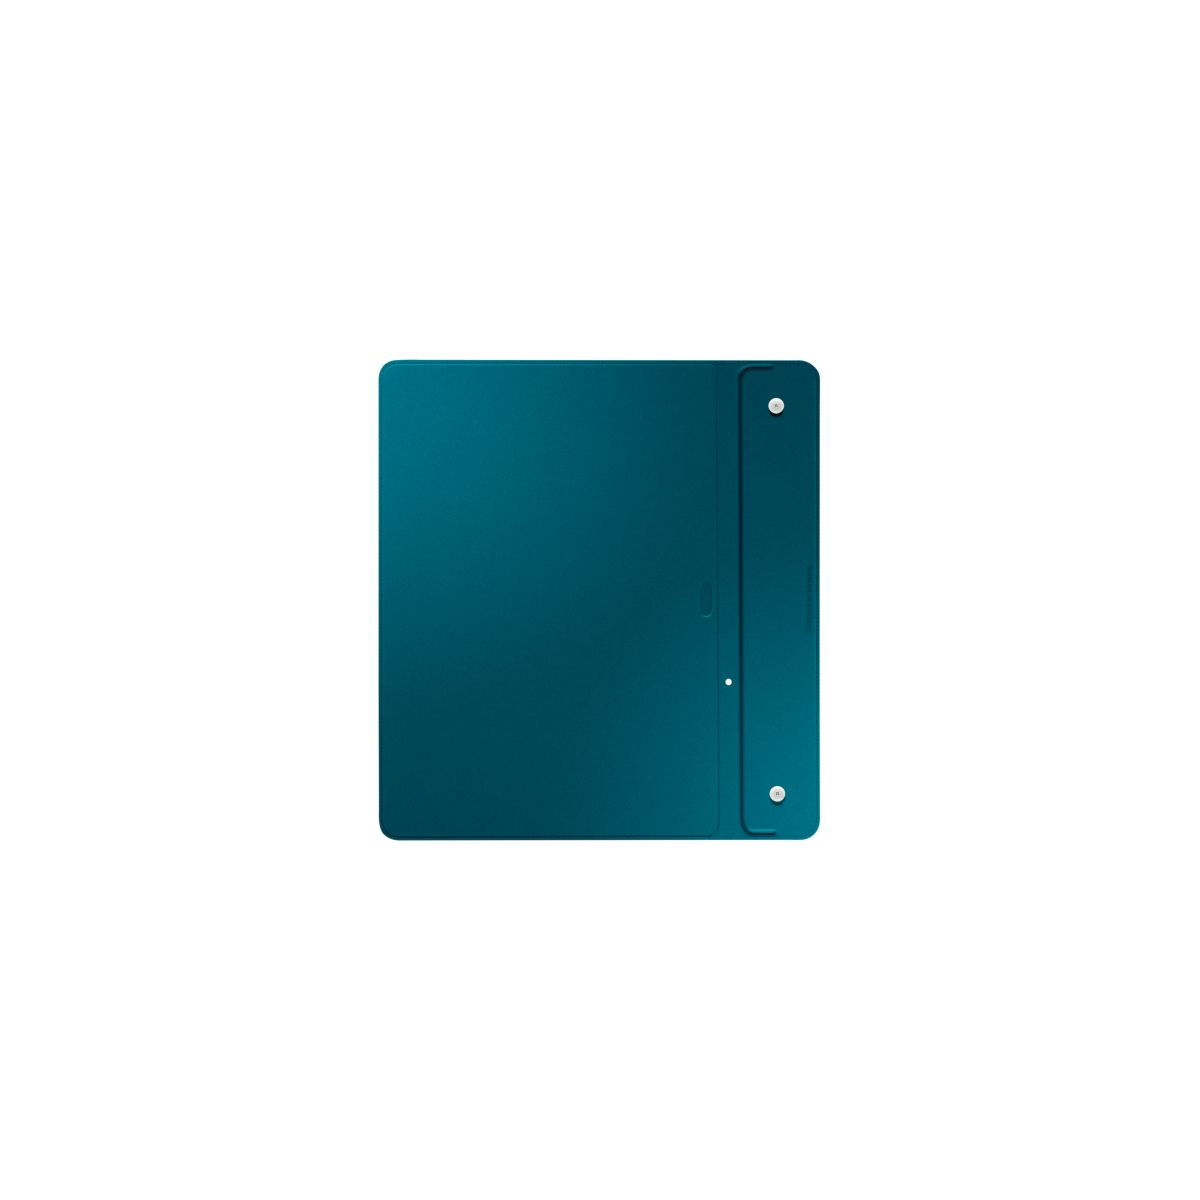 Cover samsung simple cover monaco tab s 10'' bleu - livraison offerte : code chronoff (photo)